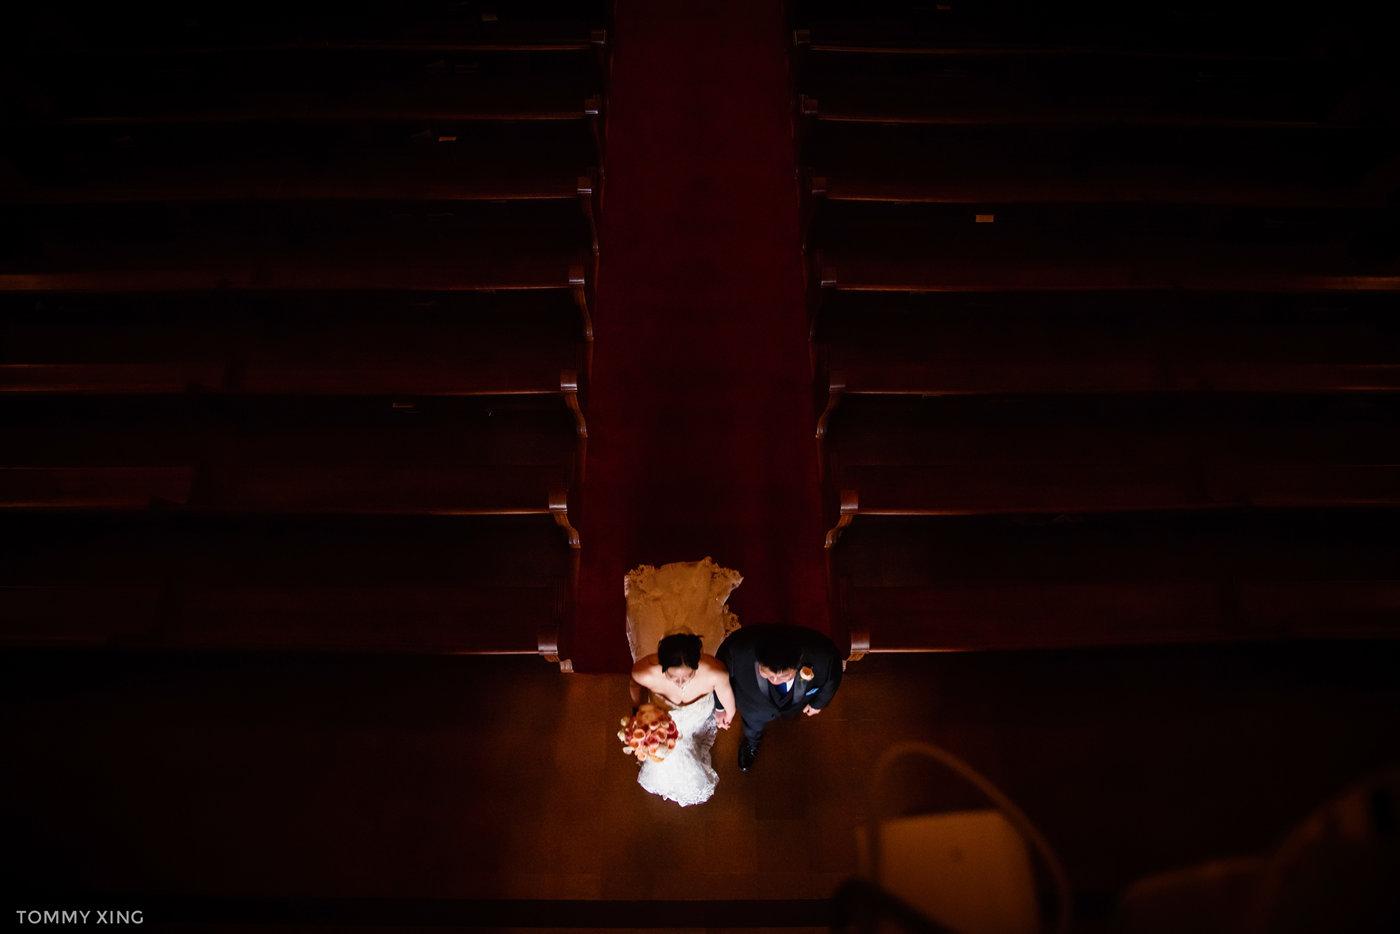 STANFORD MEMORIAL CHURCH WEDDING - Wenjie & Chengcheng - SAN FRANCISCO BAY AREA 斯坦福教堂婚礼跟拍 - 洛杉矶婚礼婚纱照摄影师 Tommy Xing Photography123.jpg